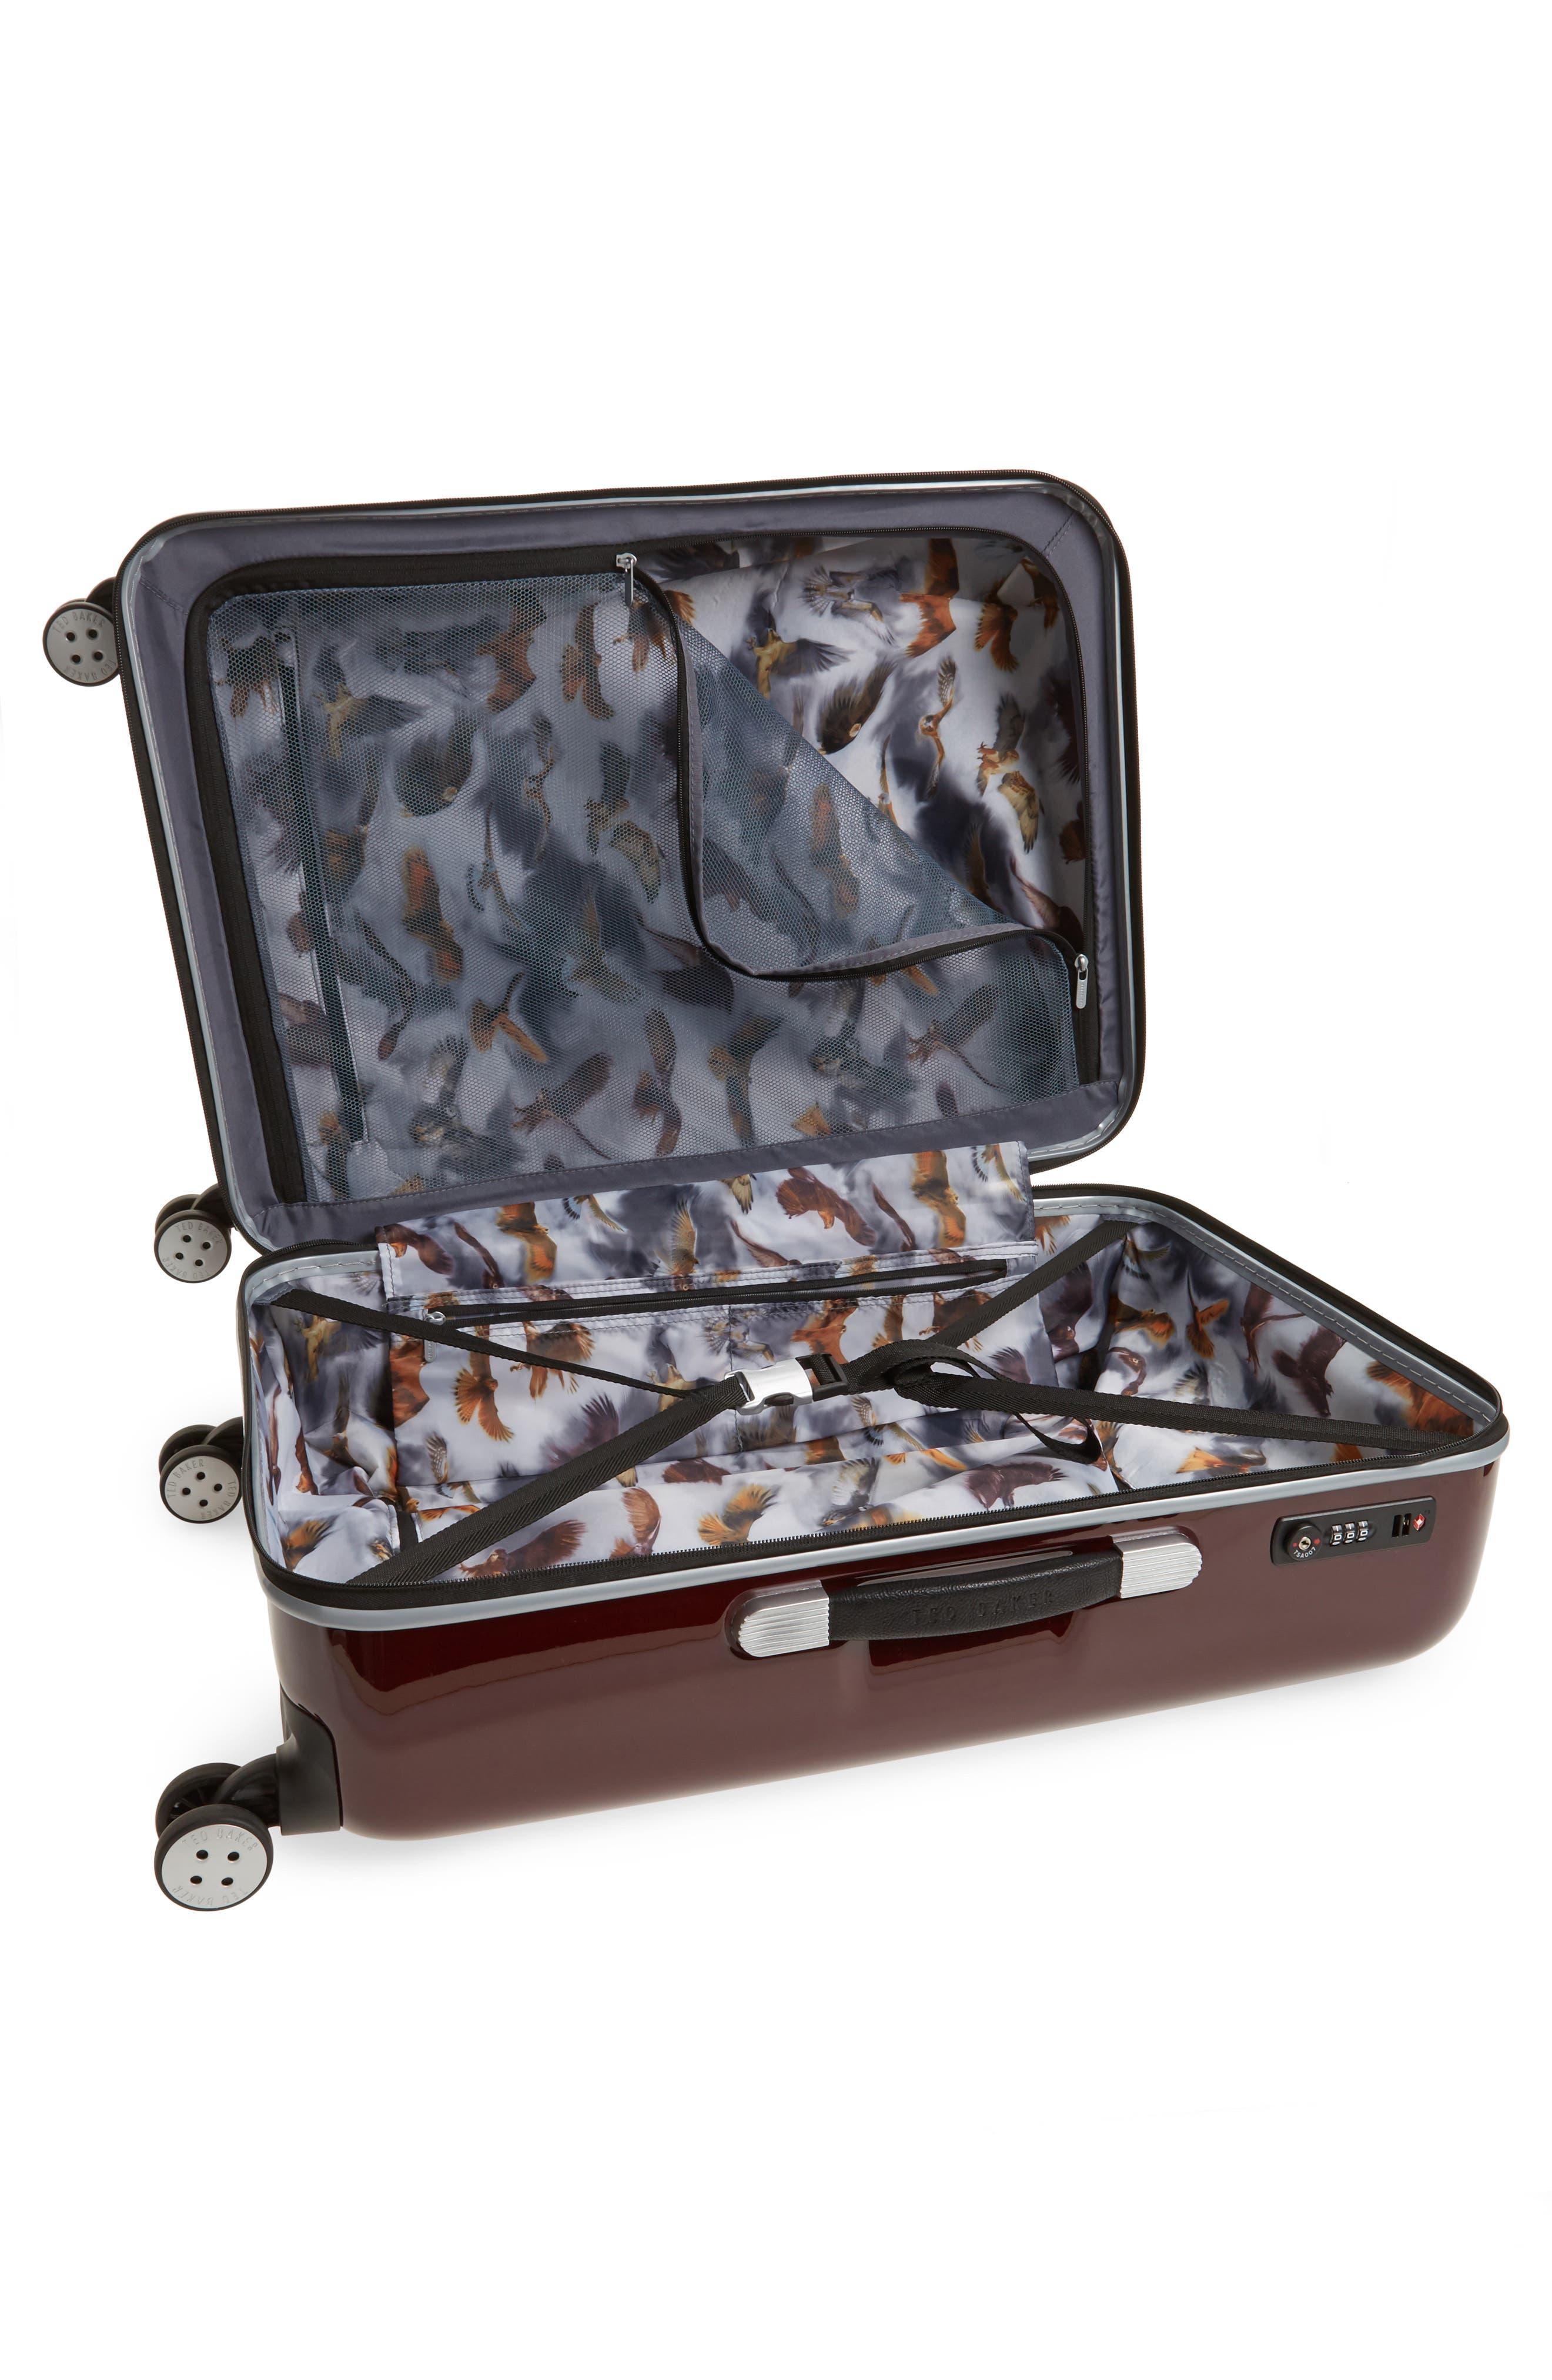 "Medium 28"" Hard Shell Spinner Suitcase,                             Alternate thumbnail 2, color,                             930"